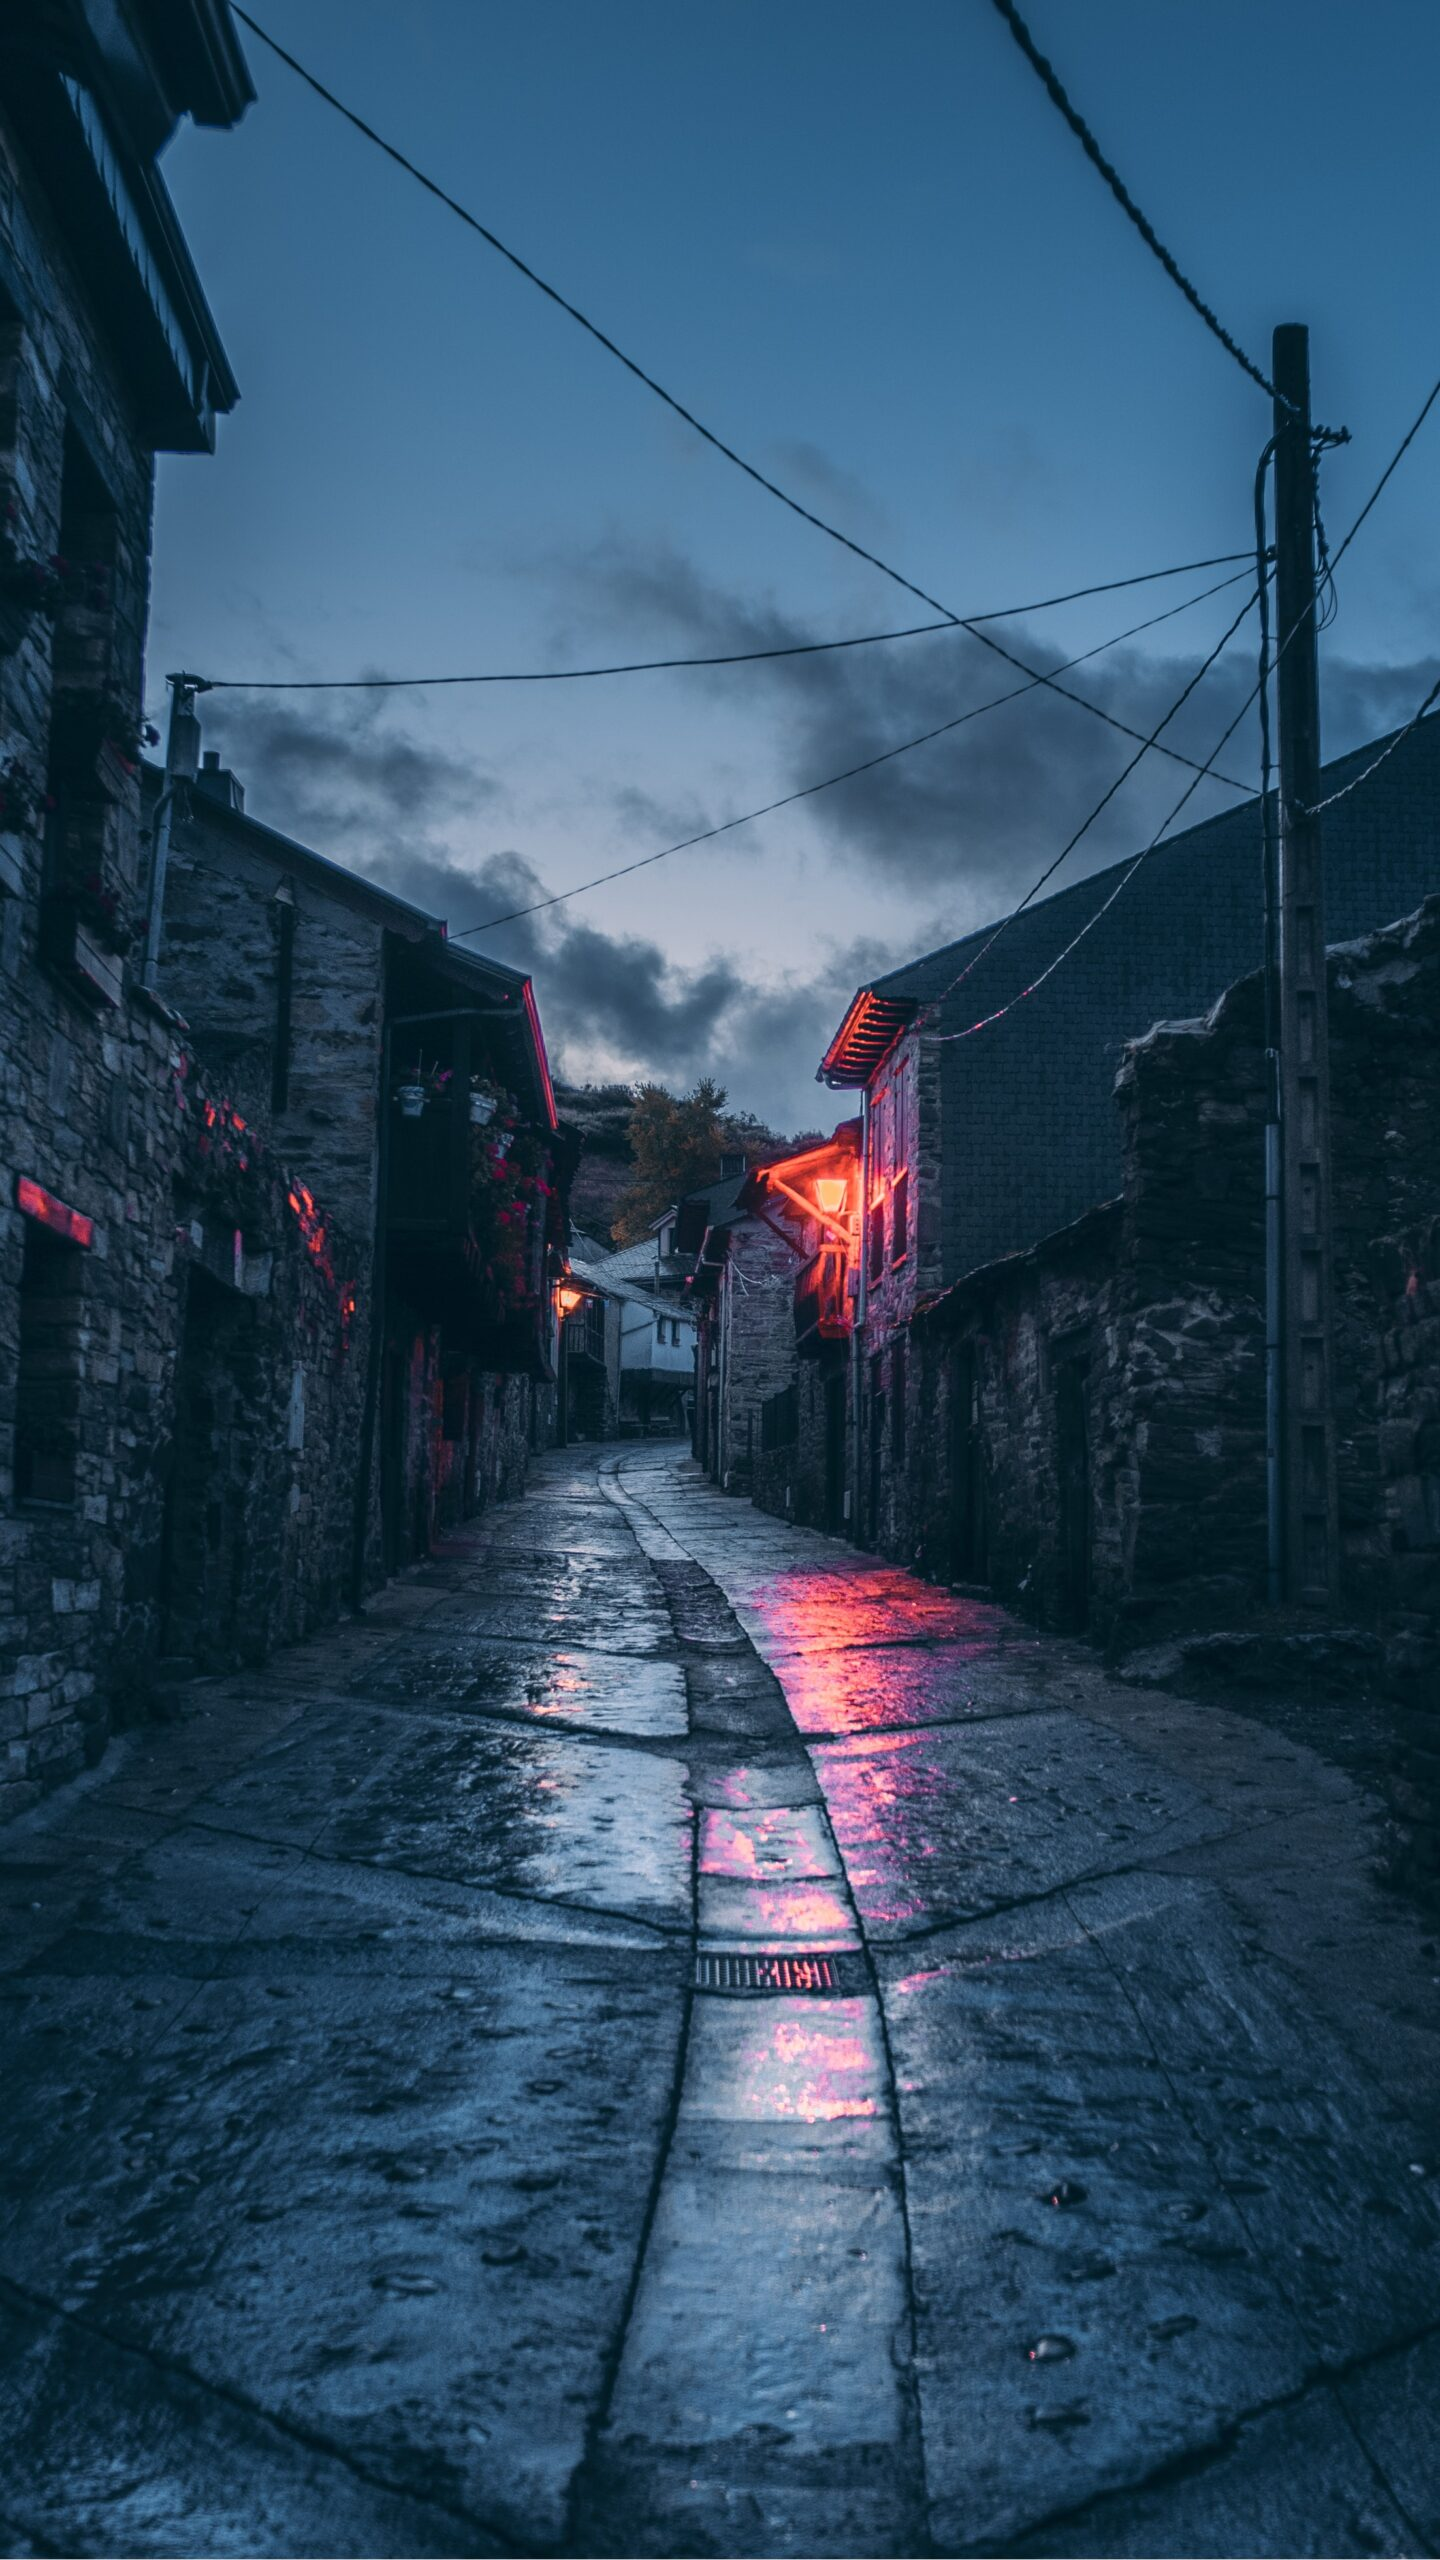 daniele-colucci-Glasgow City Cobbled narrow Street after rain at dusk-unsplash